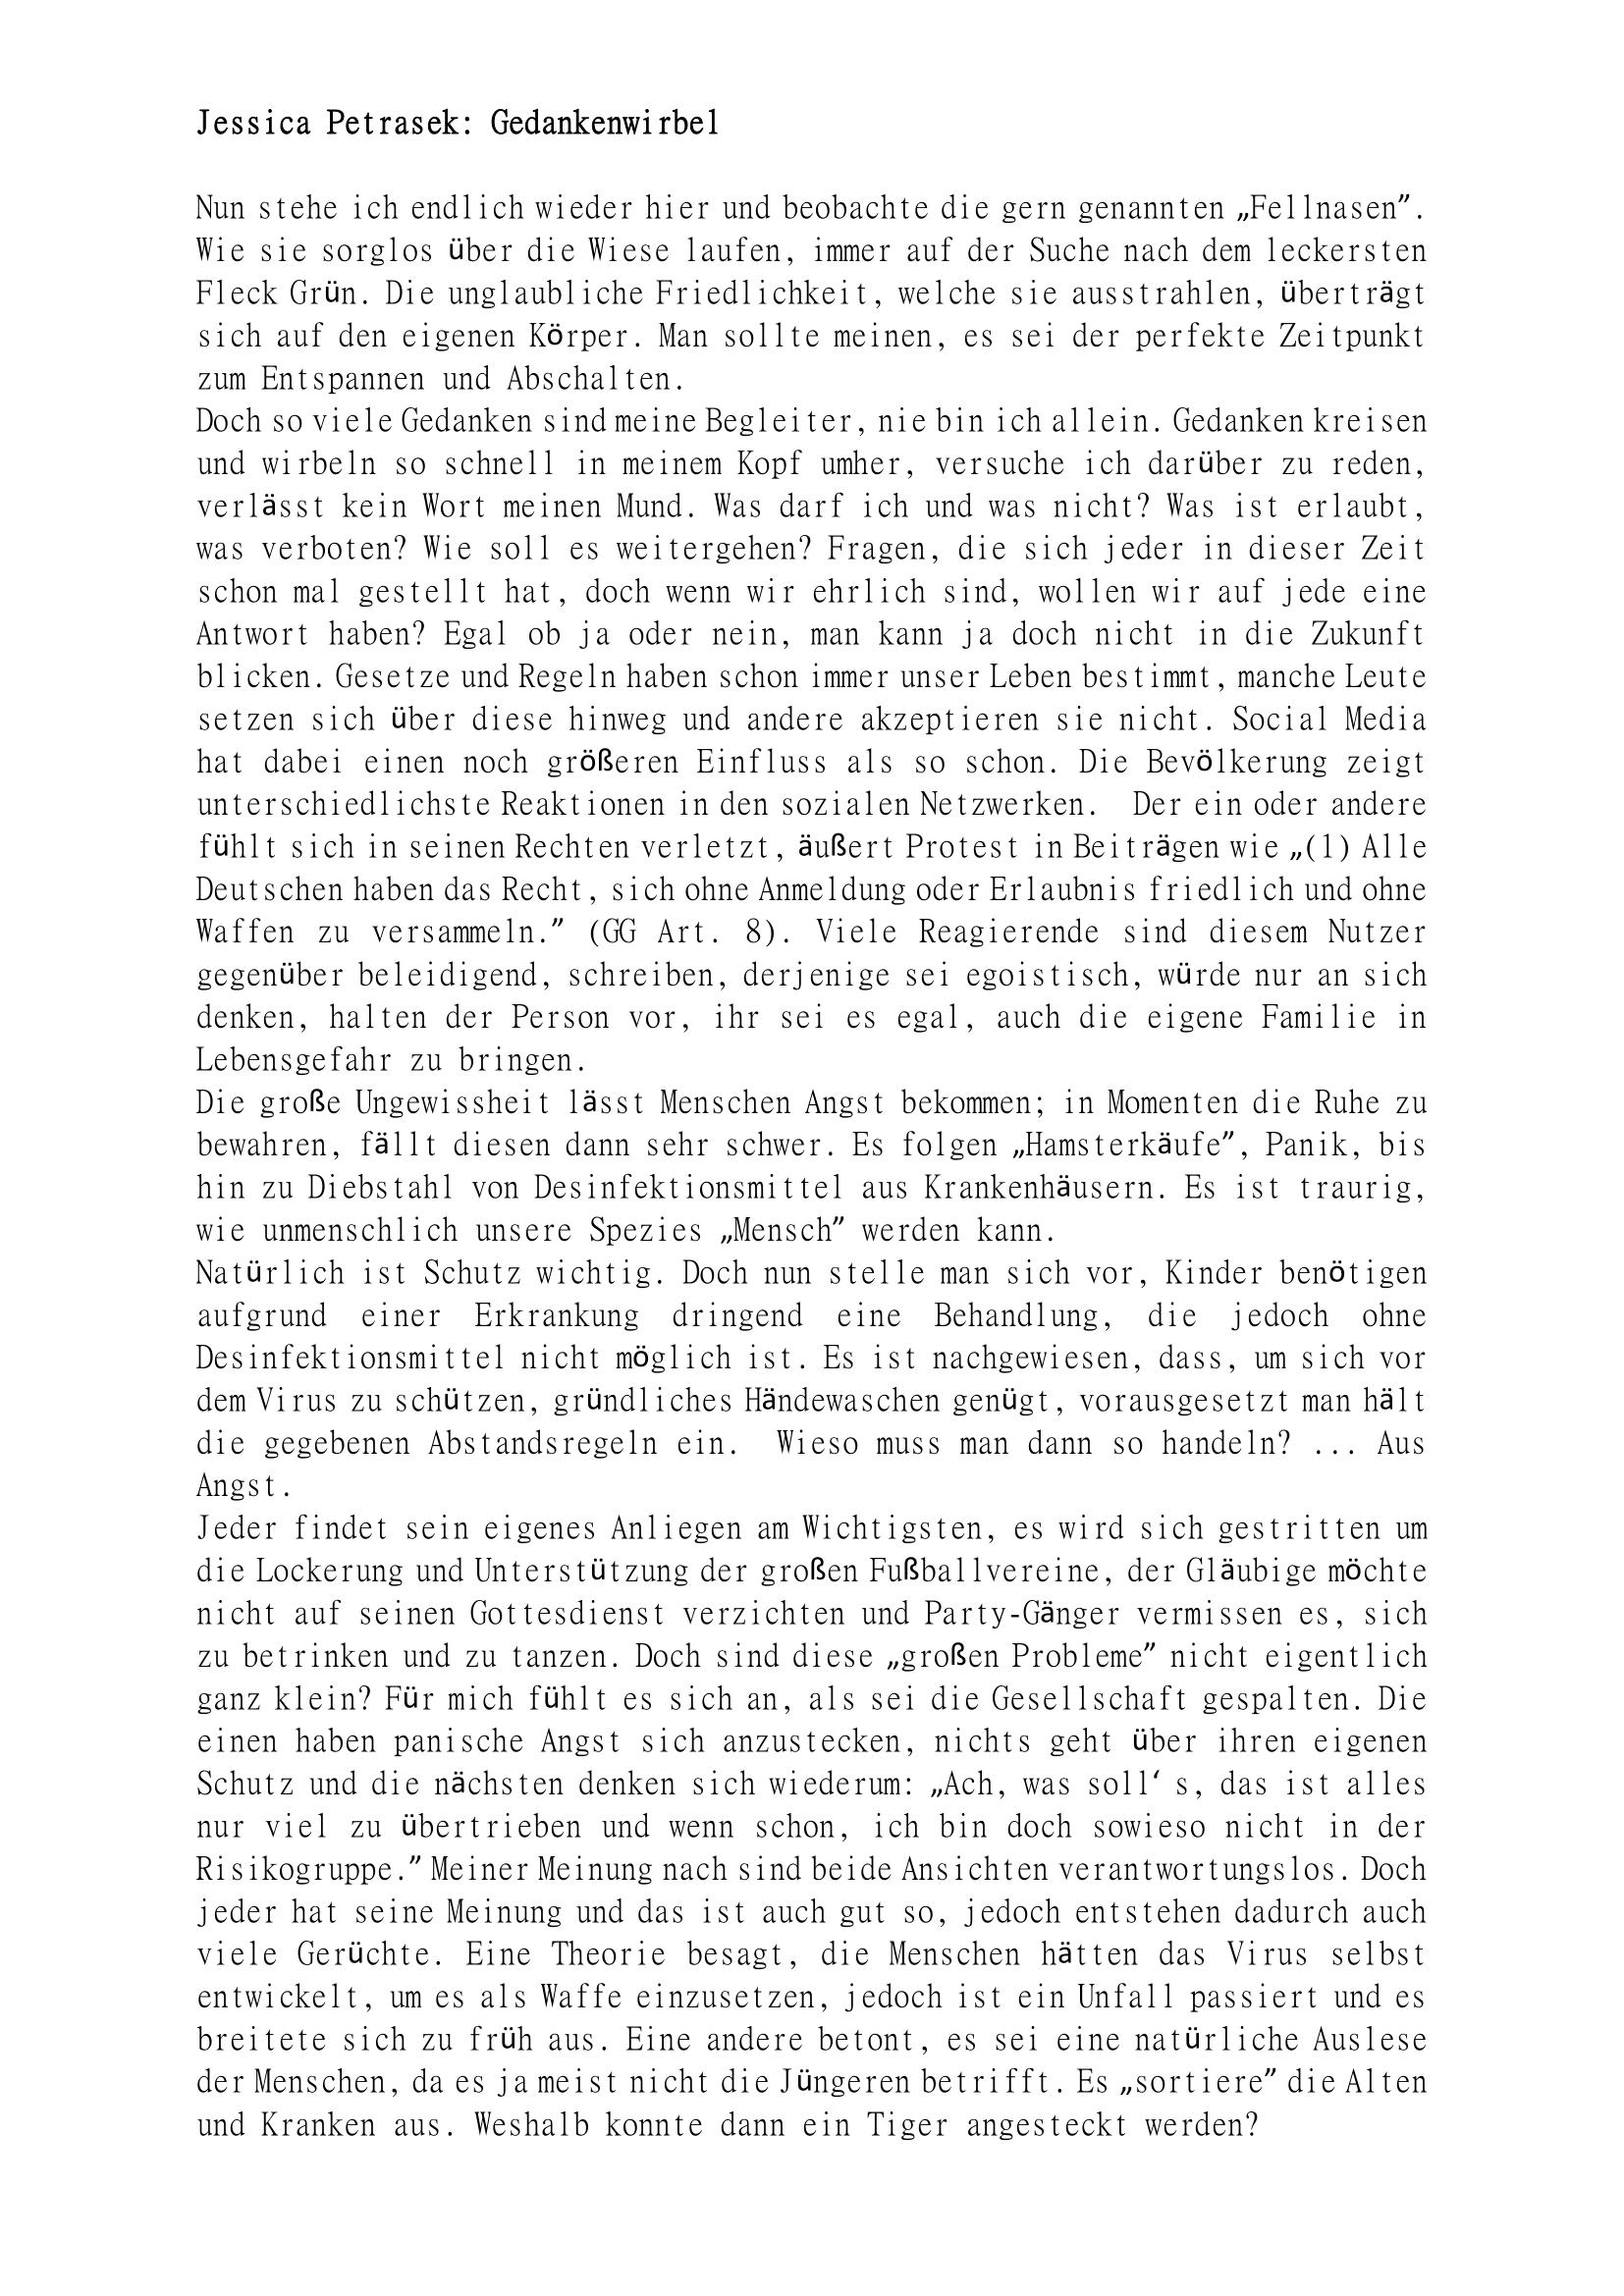 Gedankenwirbel (Teil 1)